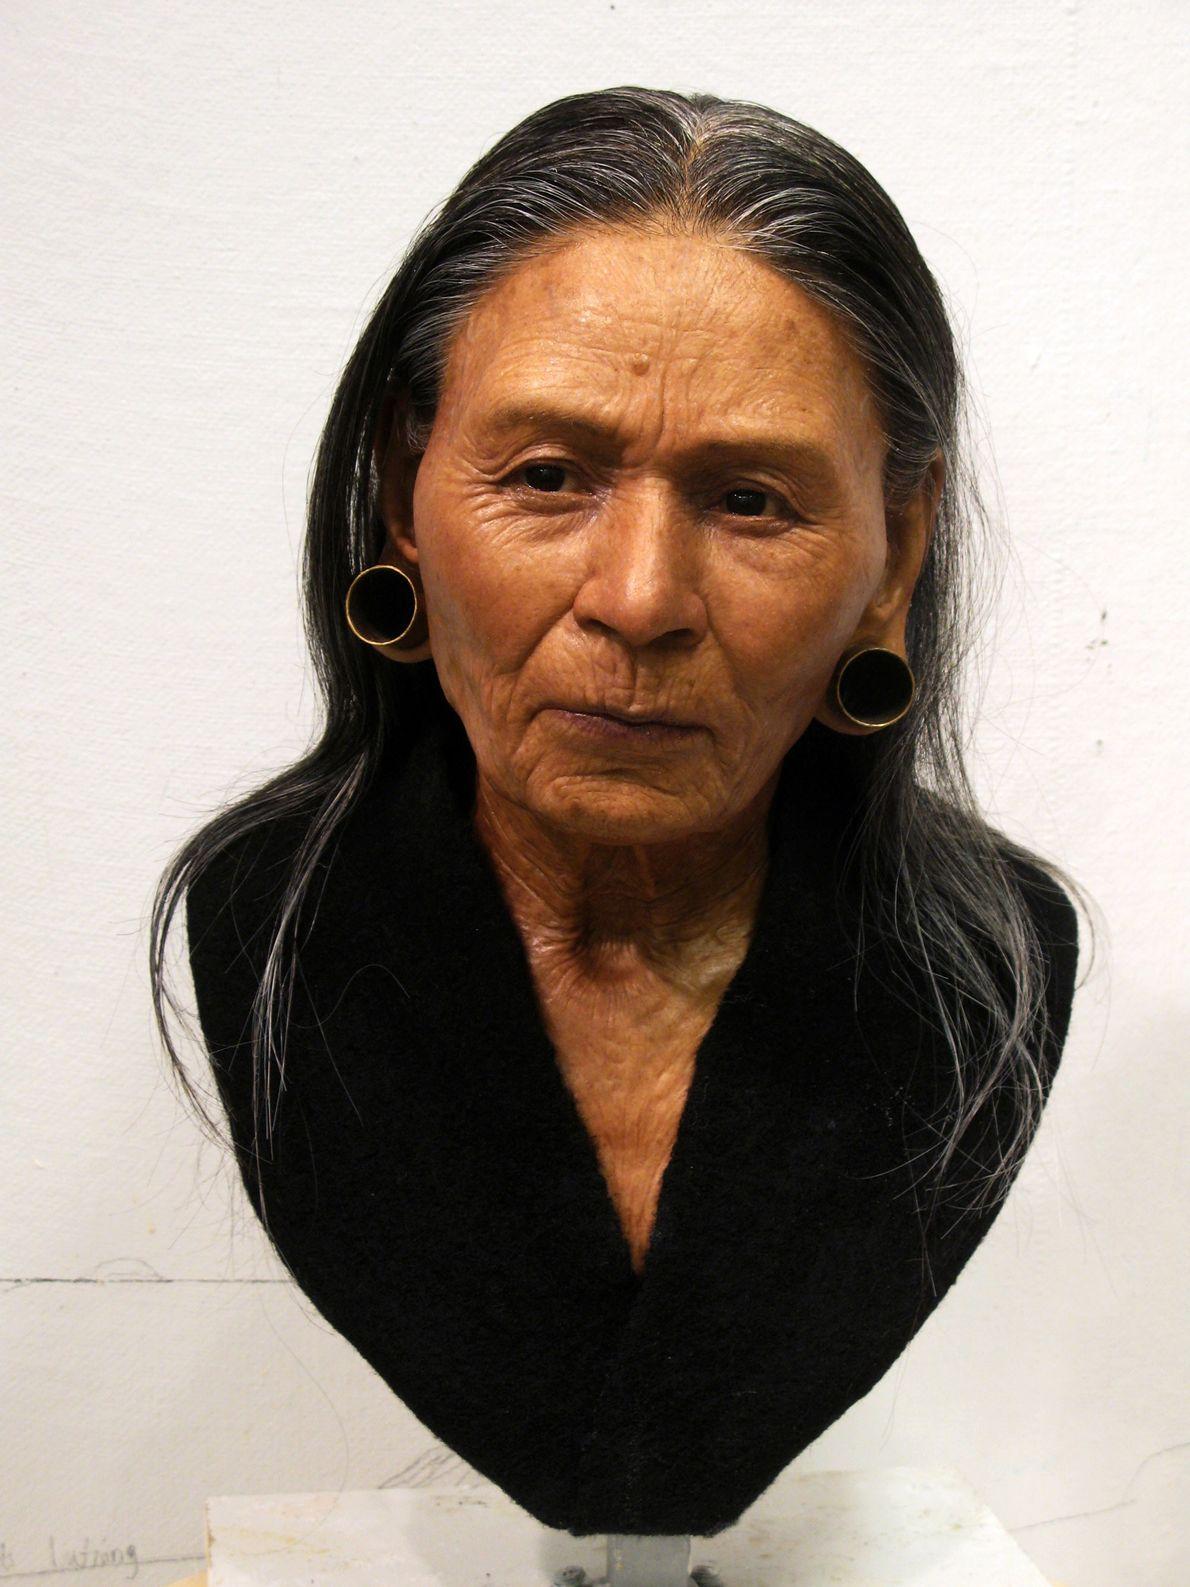 peruca simula cabelo de rainha peruana